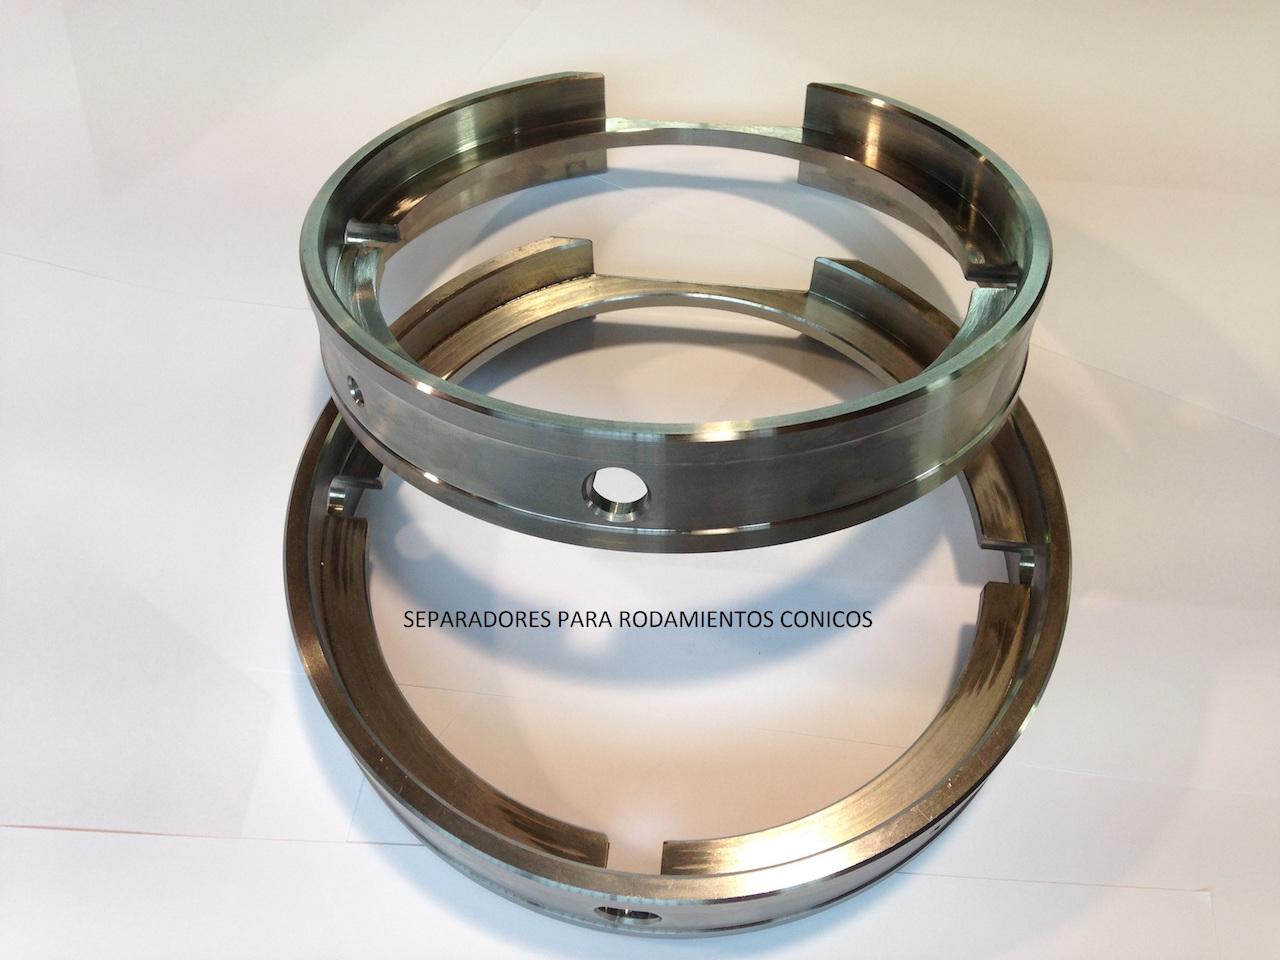 separadores para rodamentos conicos